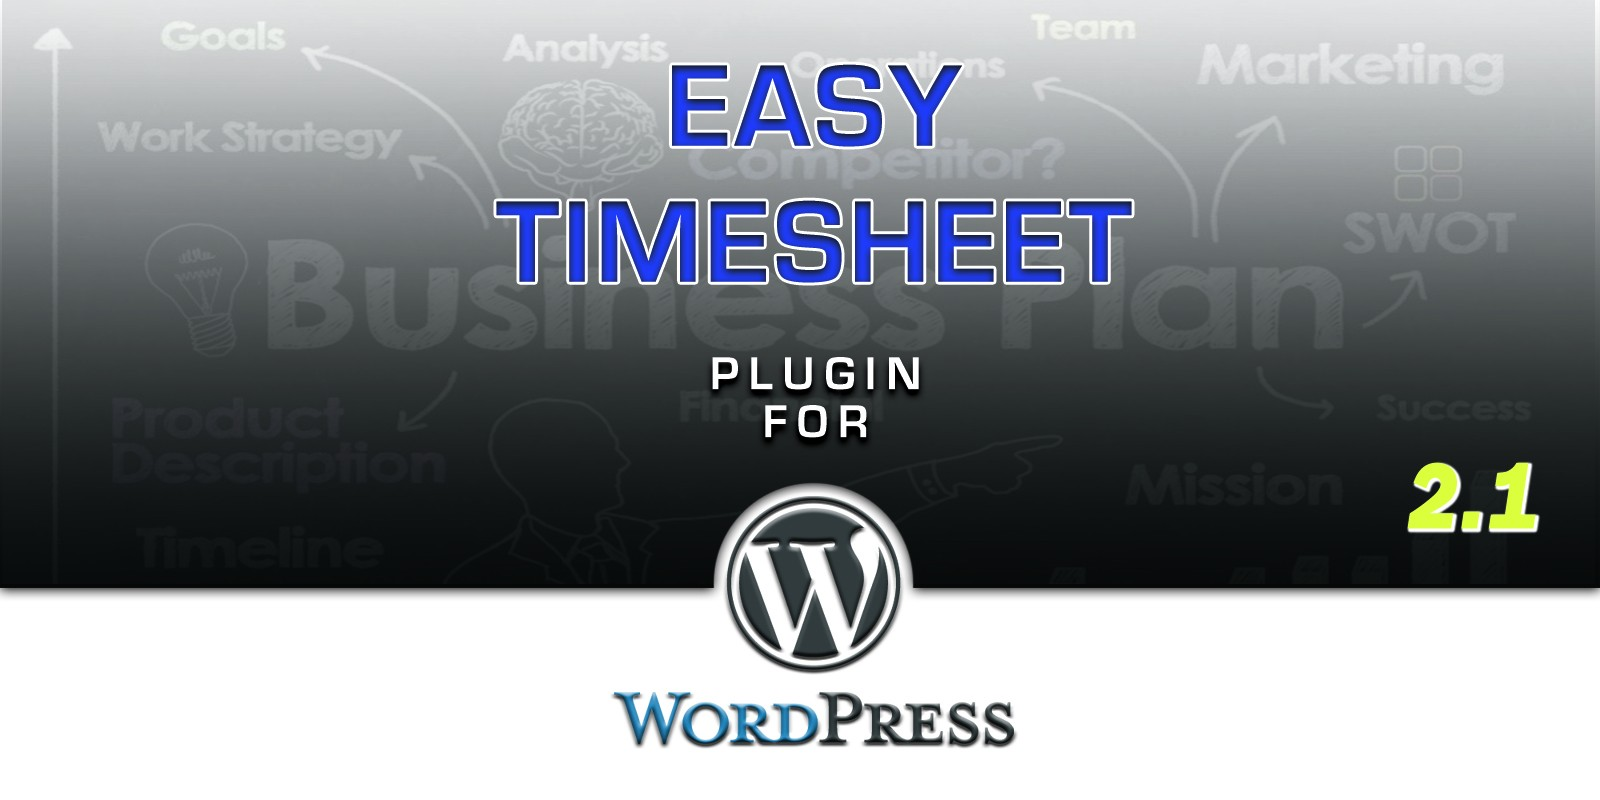 Easy Timesheet Plugin For WordPress